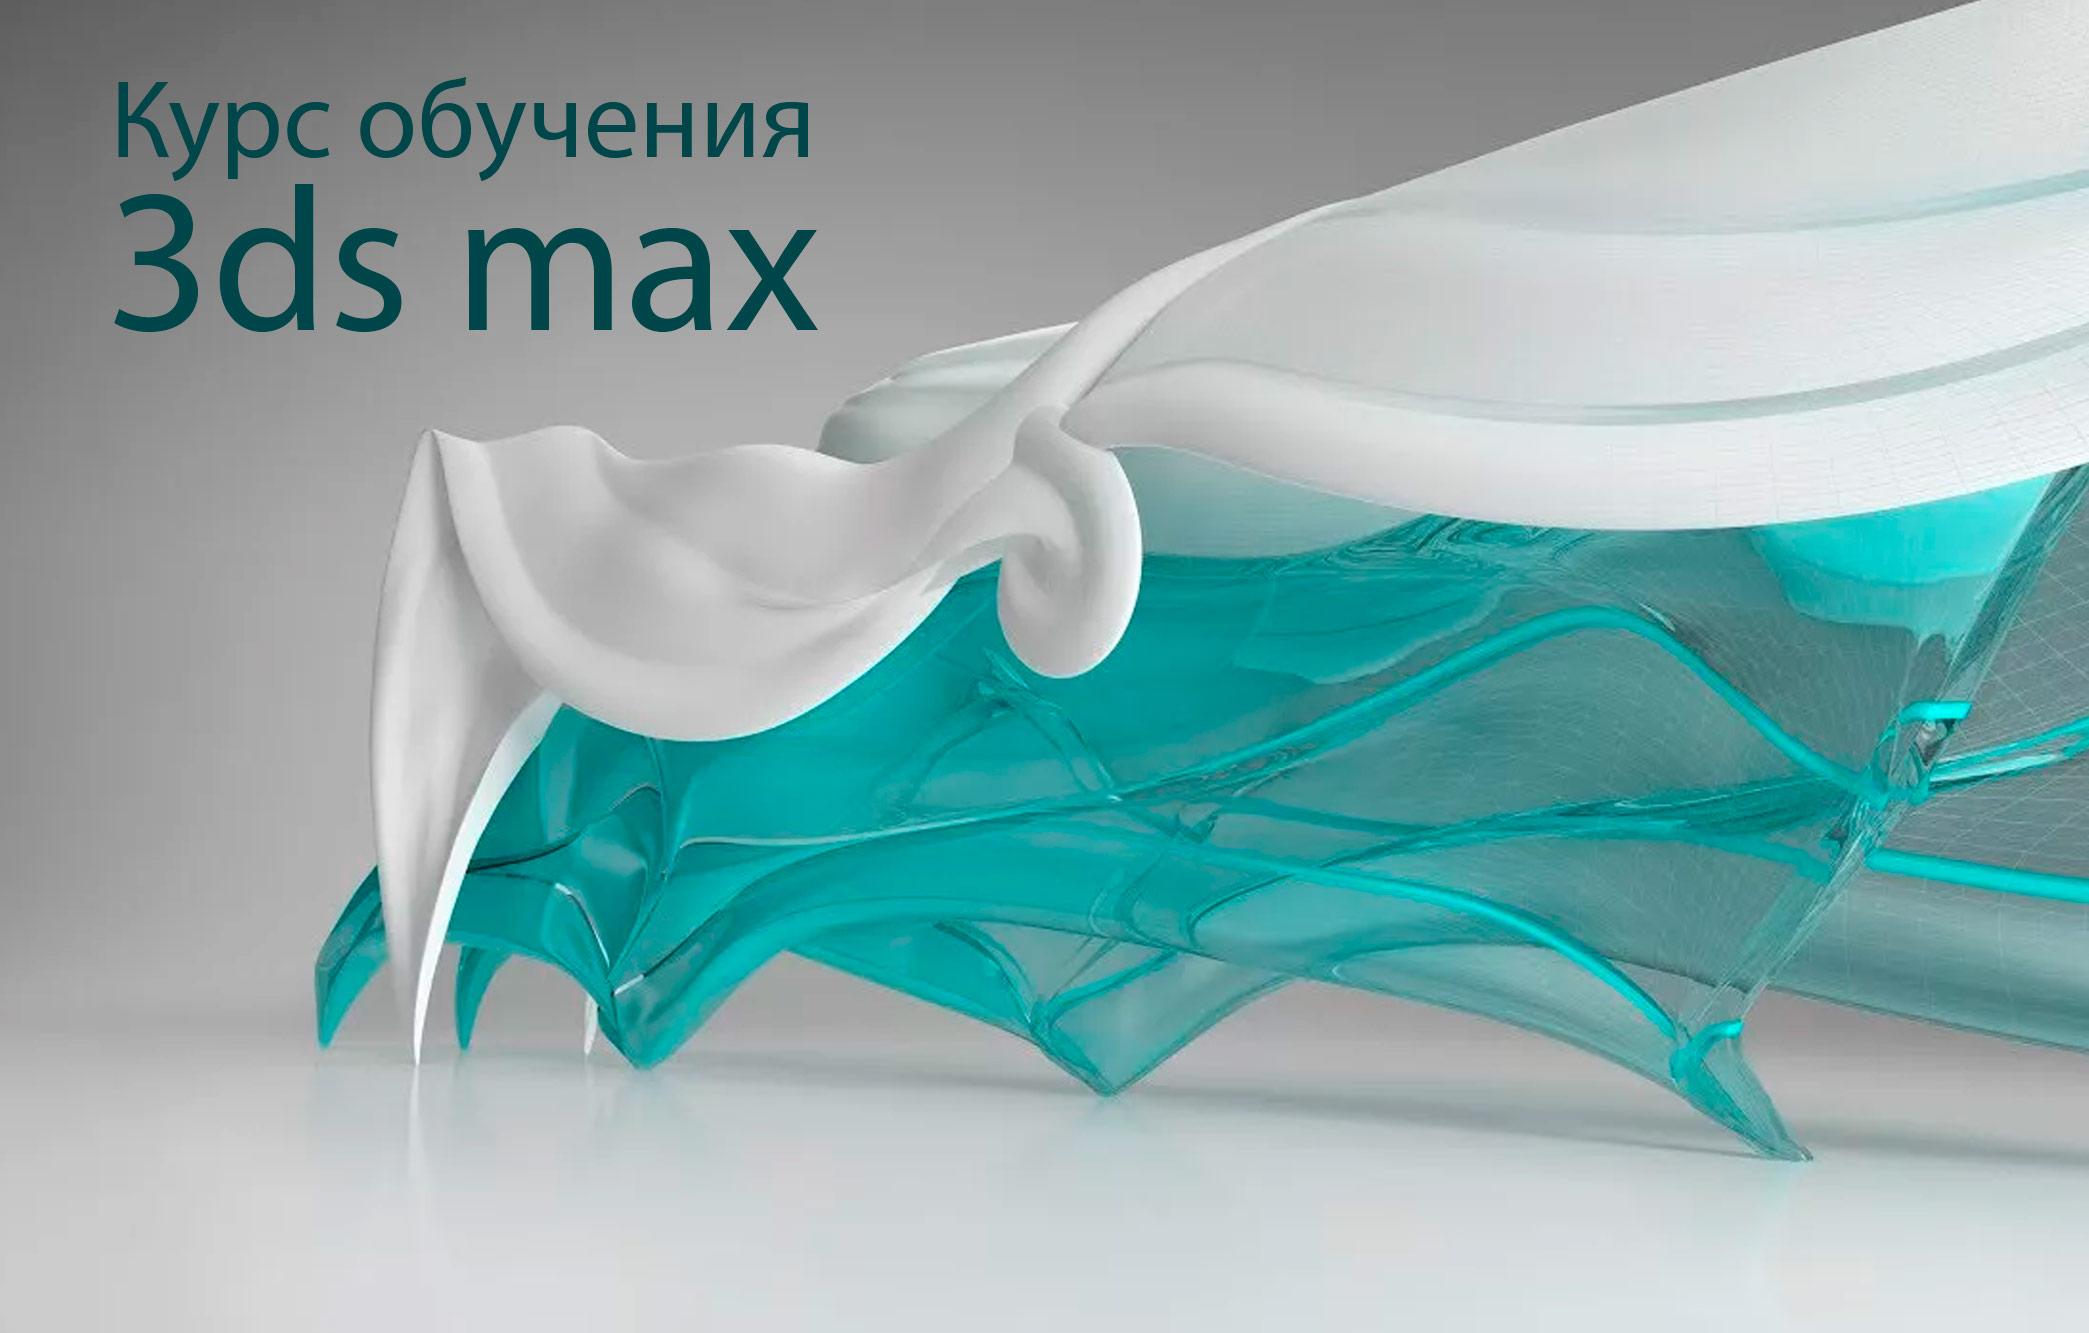 Курс обучения 3ds max